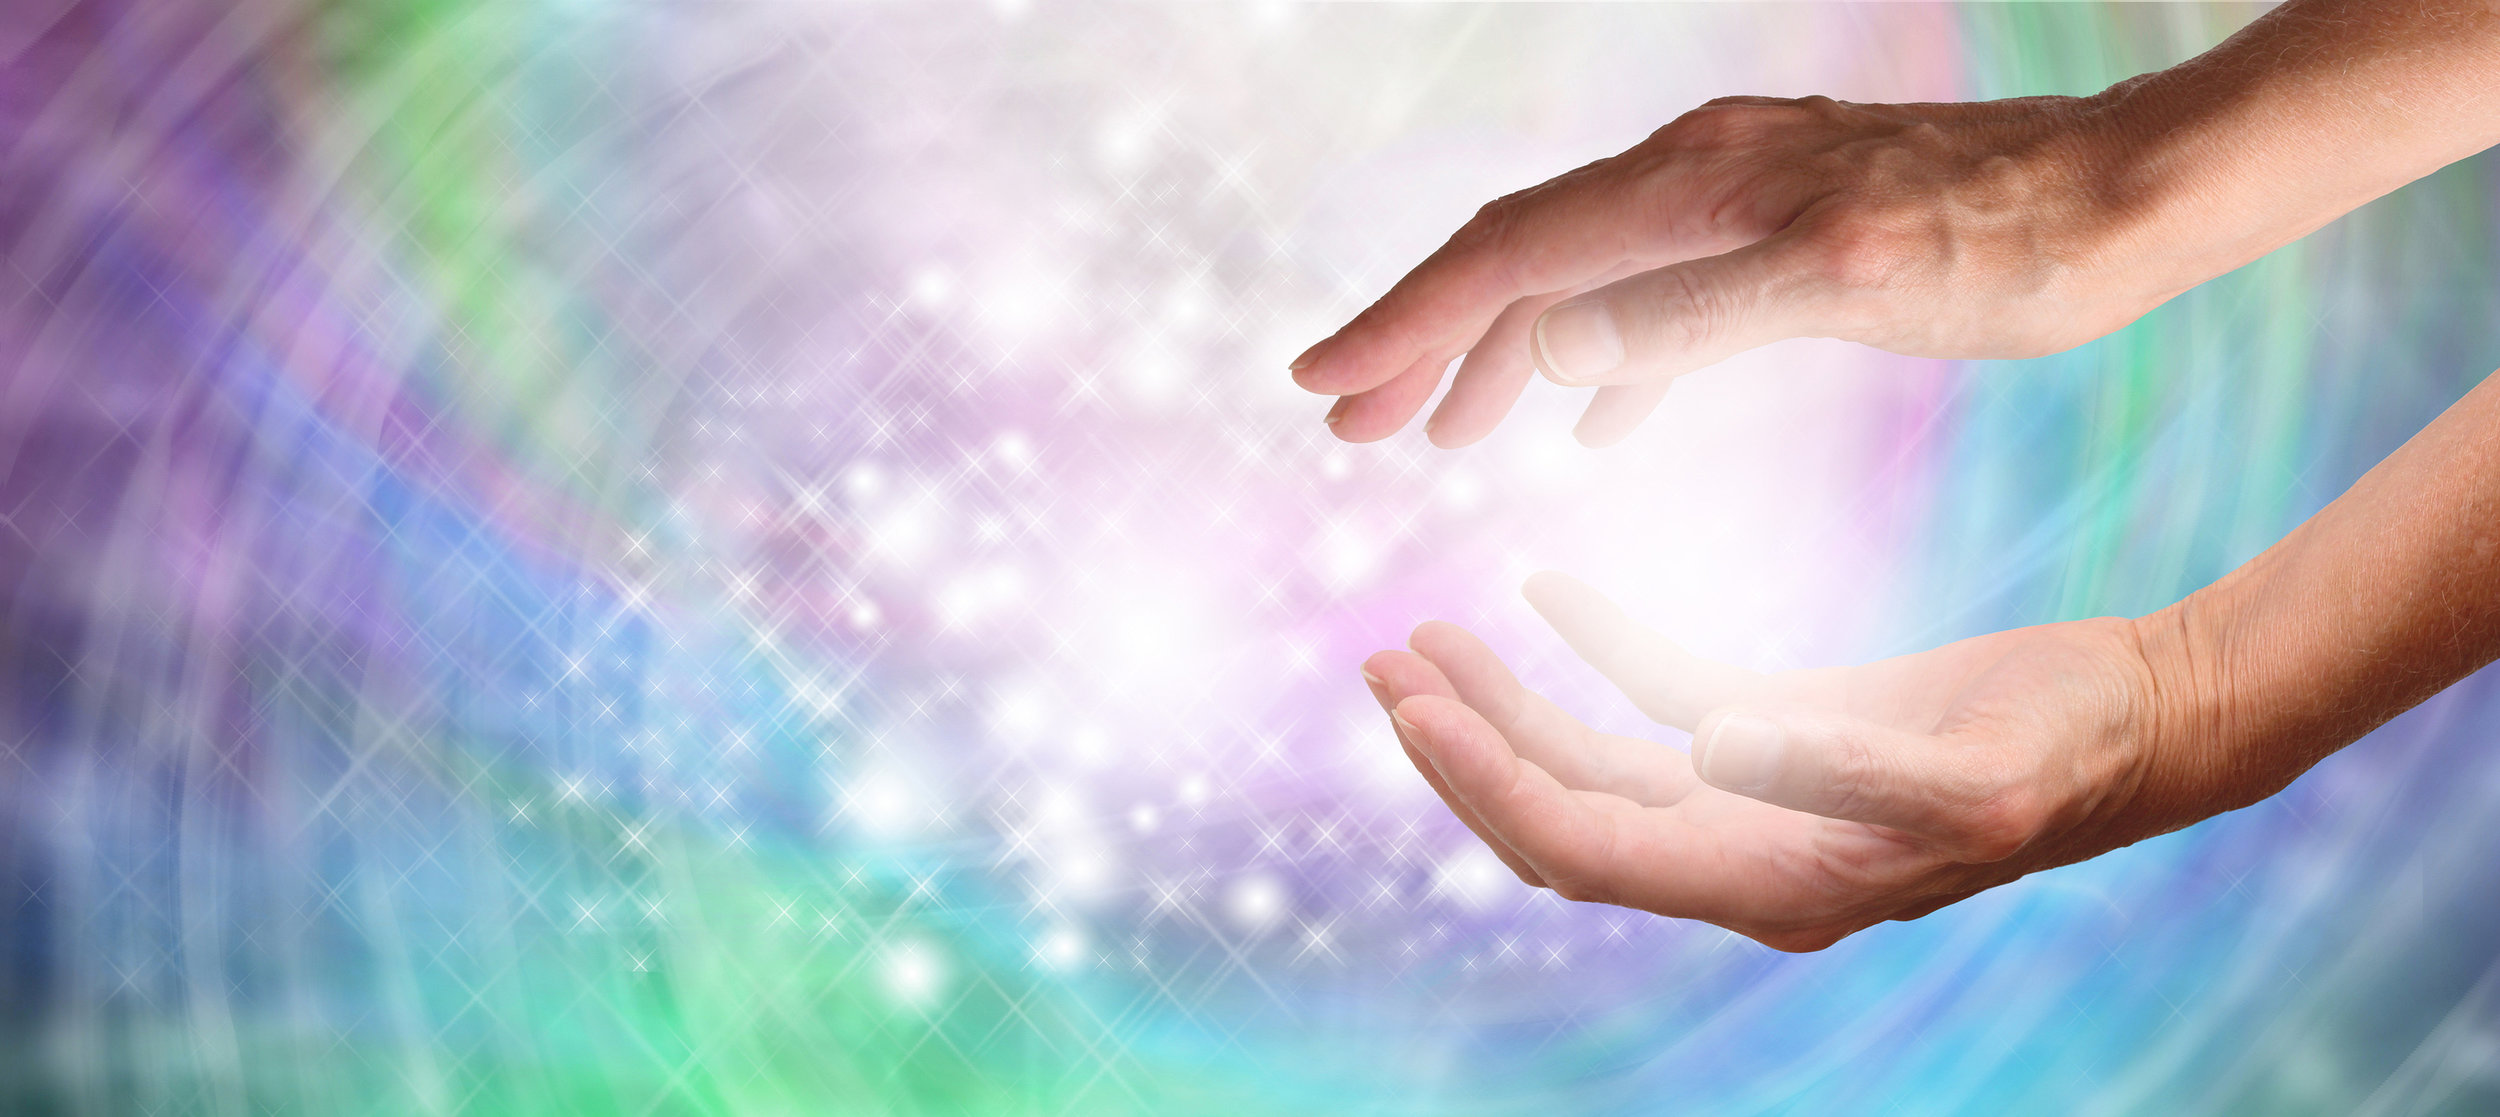 bigstock-Healer-s-Sparkling-Energy-Webs-65787895.jpg